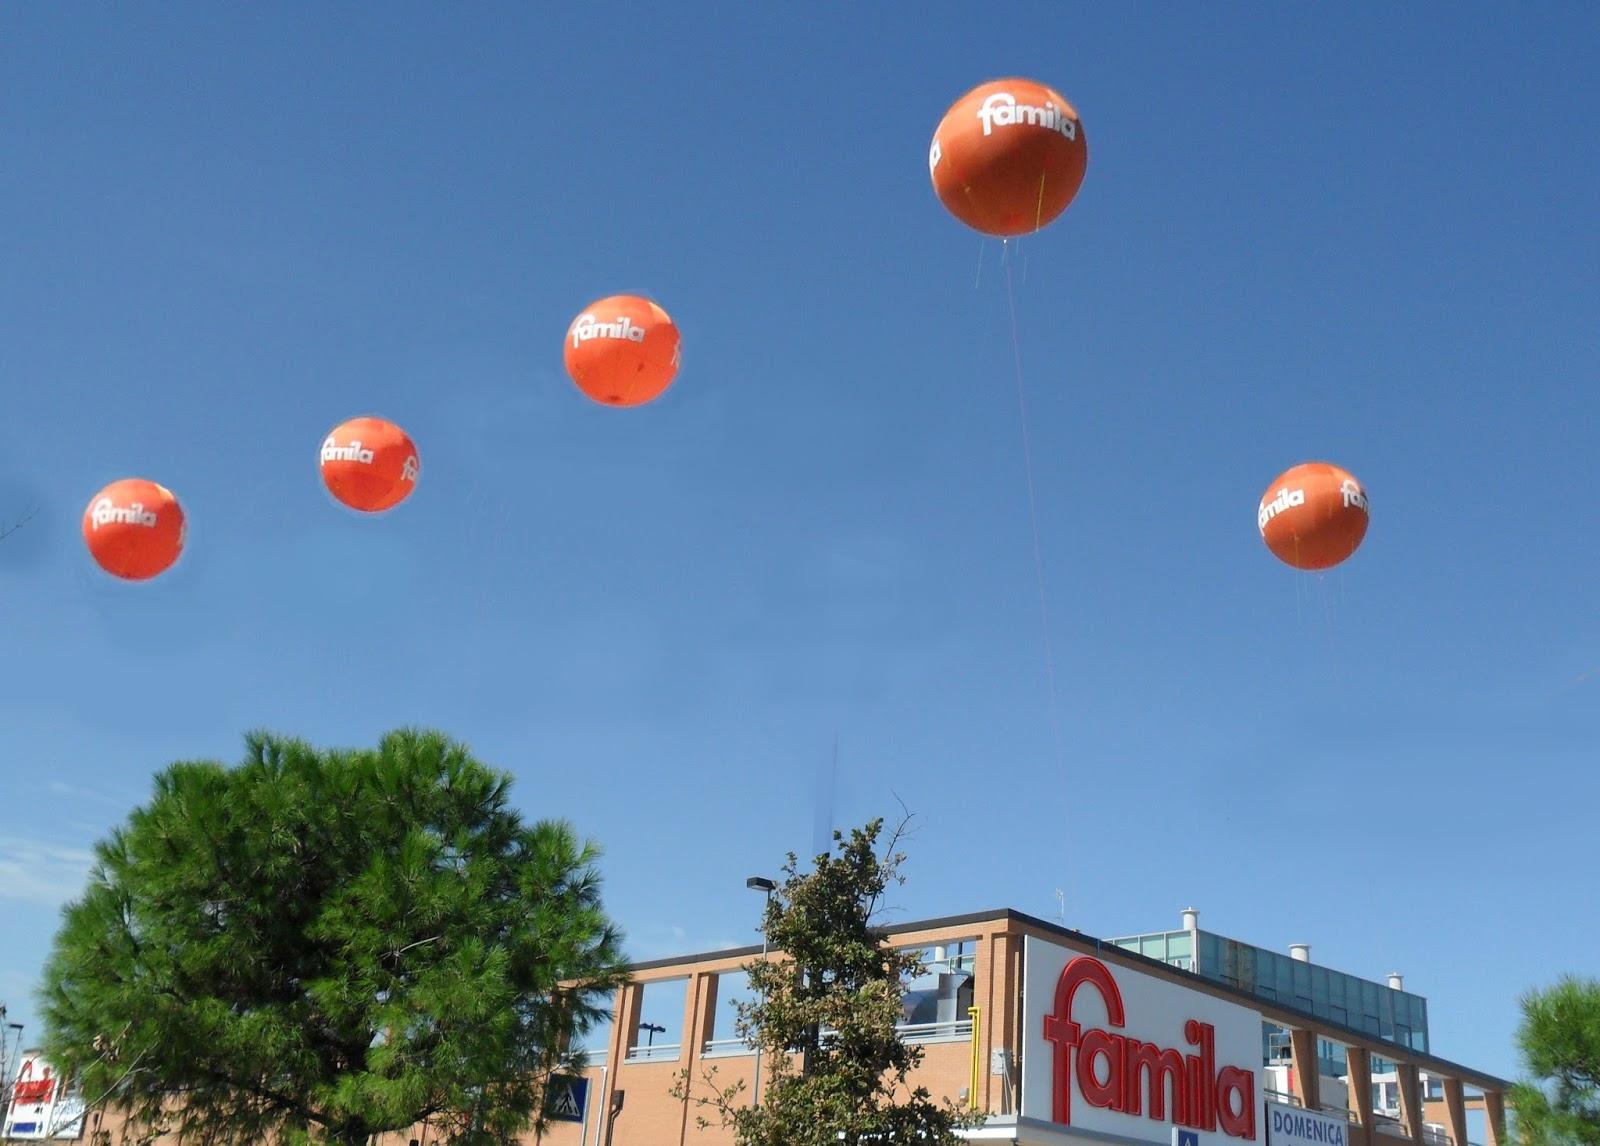 Palloni gonfiabili a elio